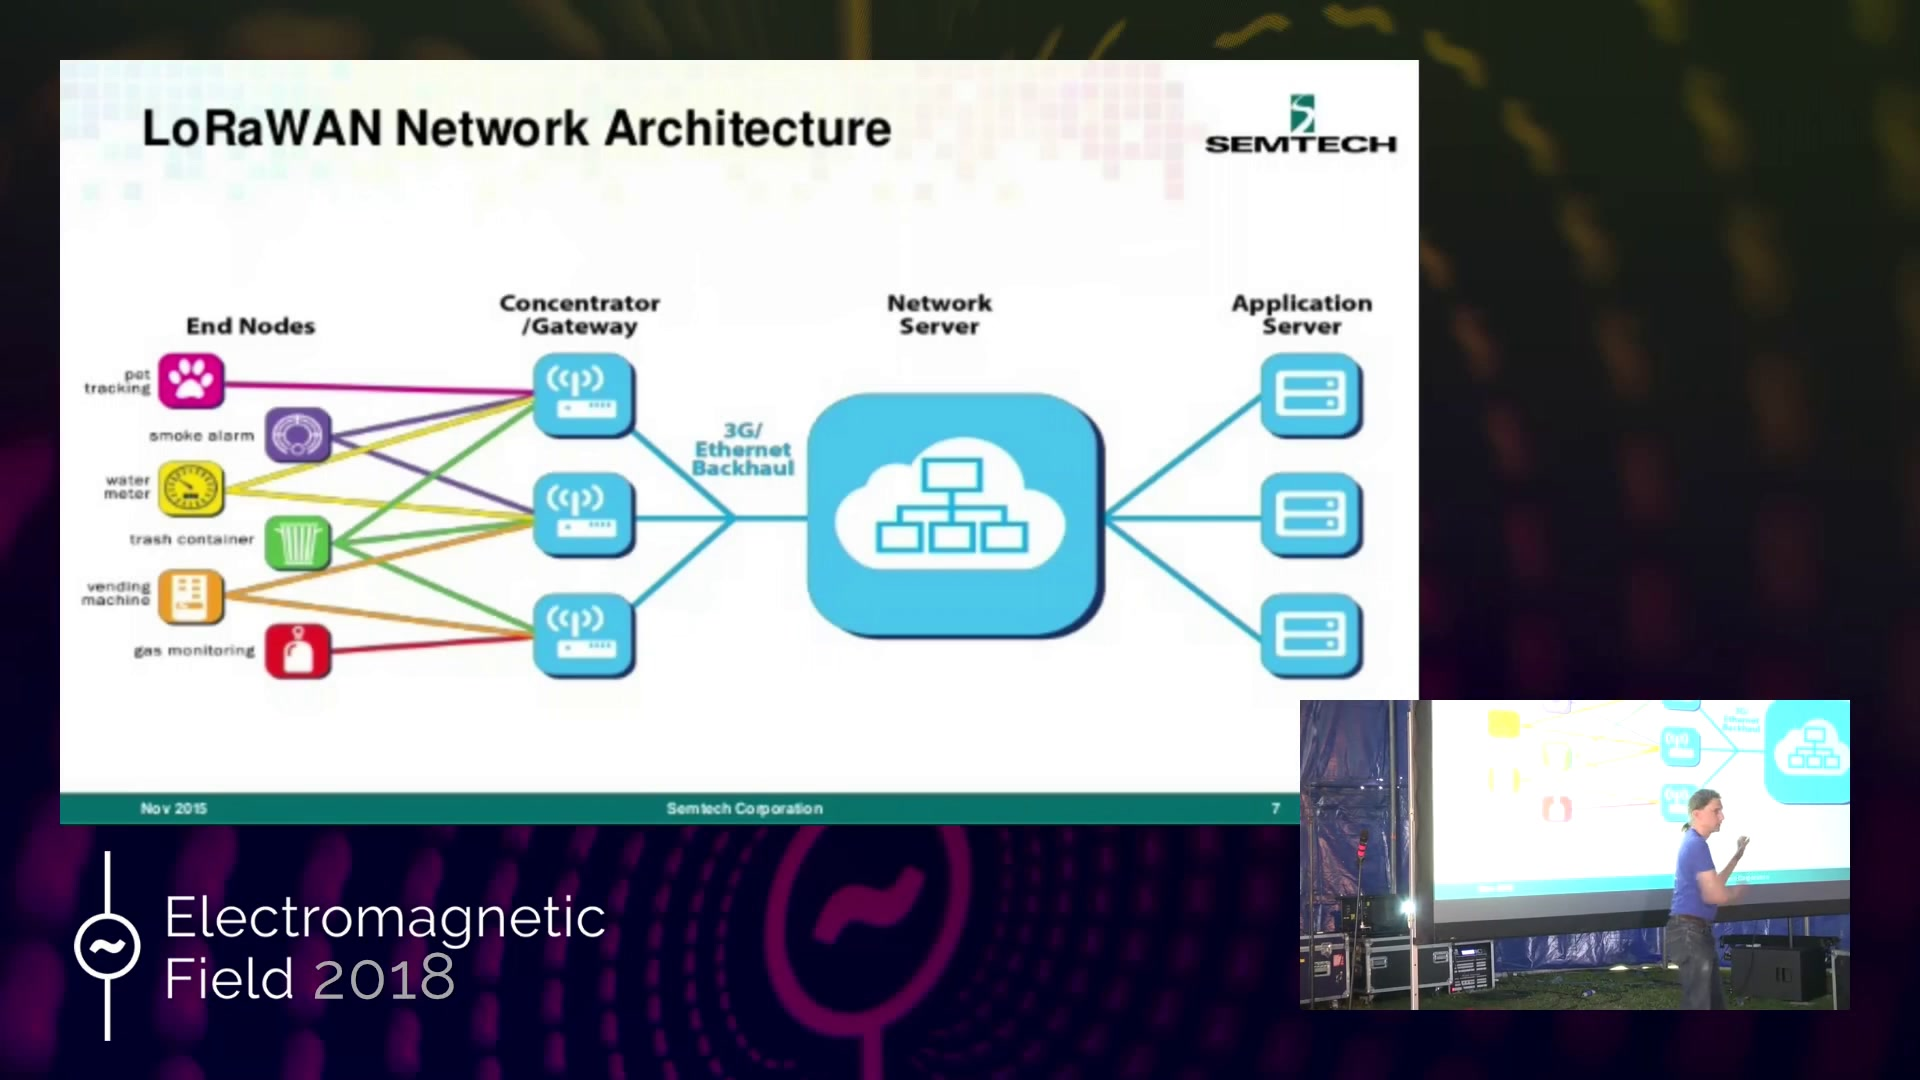 media ccc de - Deploying a LoRaWAN network